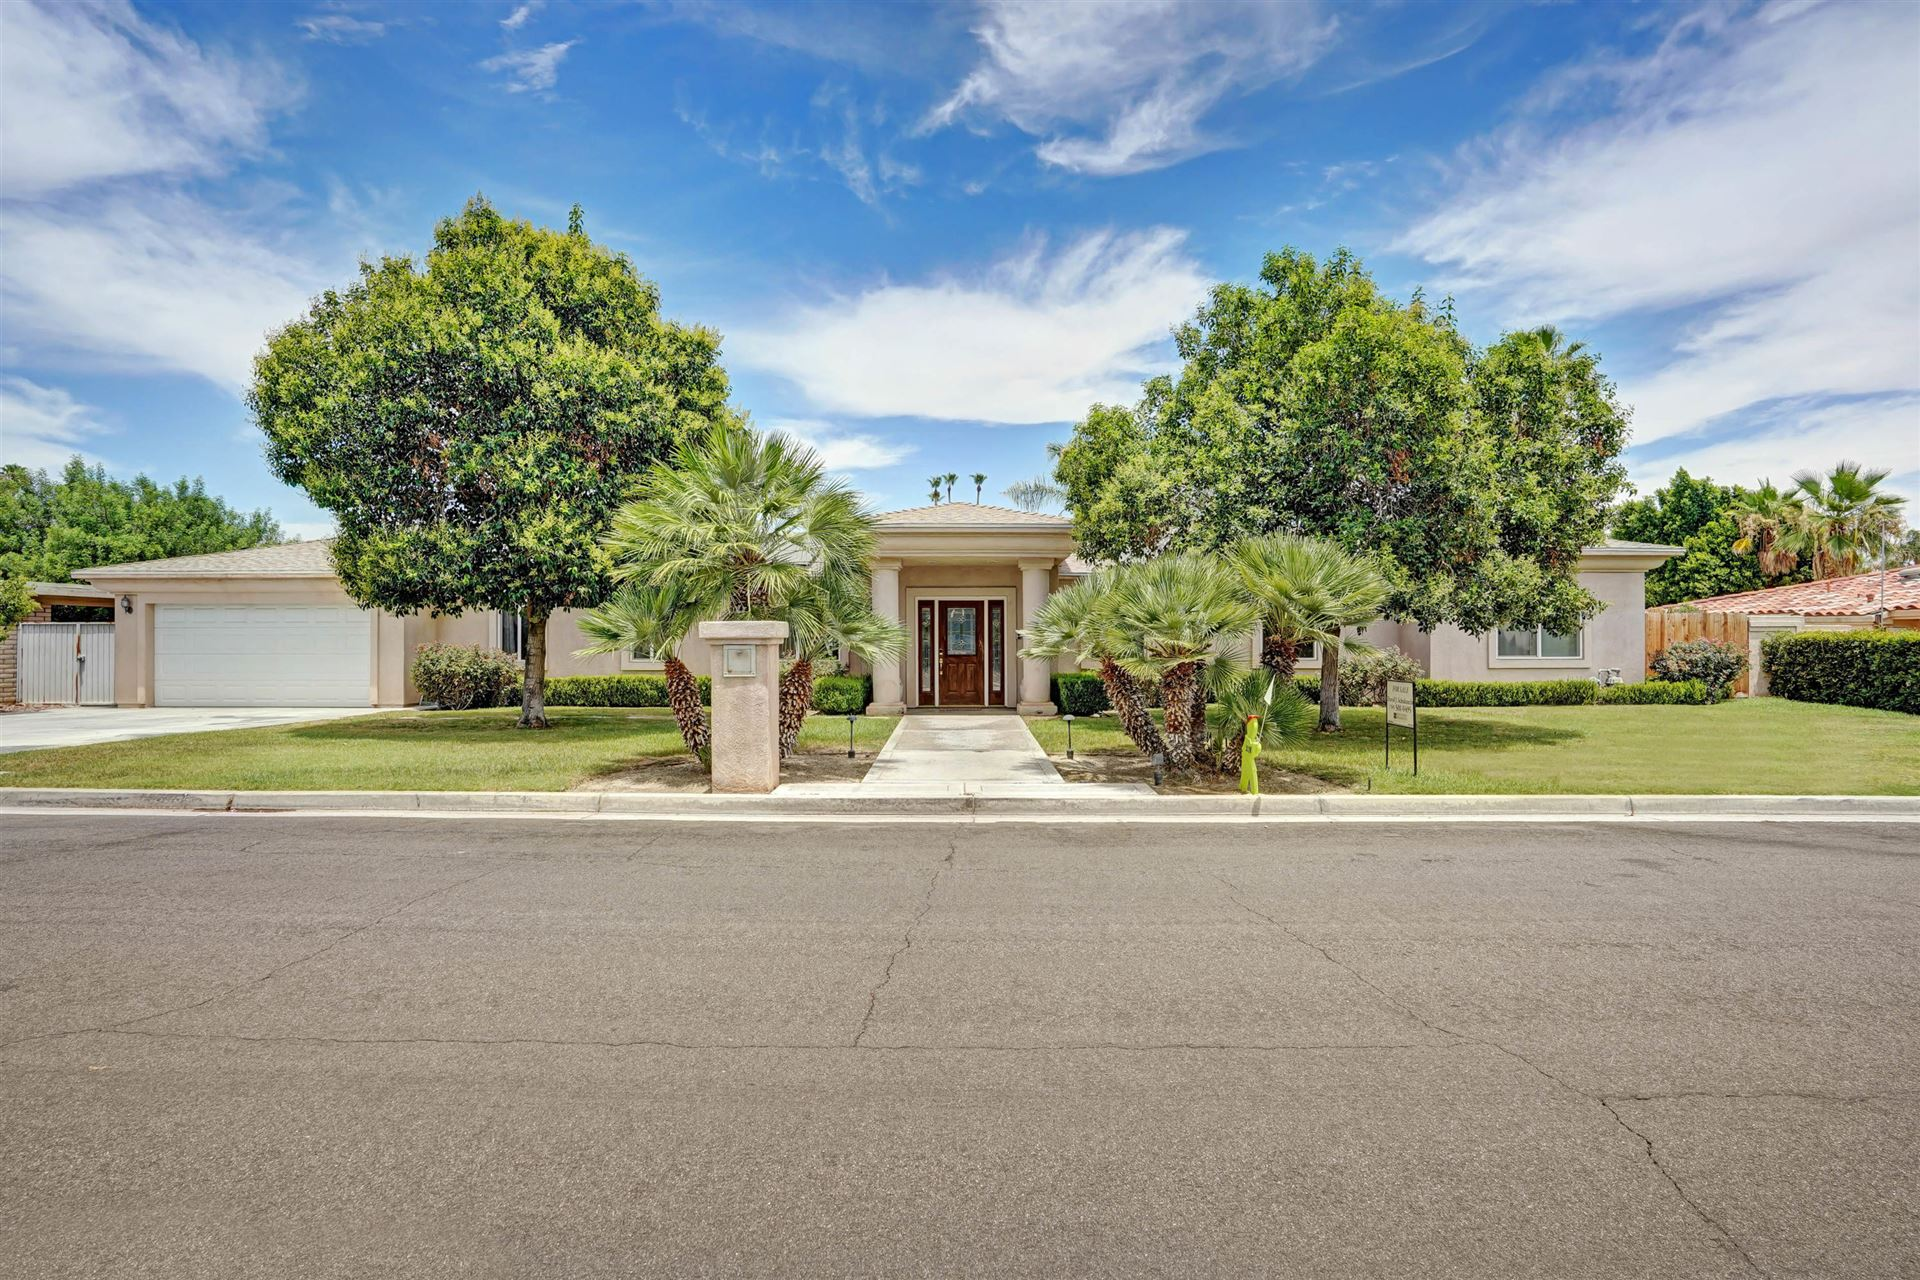 72374 Rancho Road, Rancho Mirage, CA 92270 - MLS#: 219045060